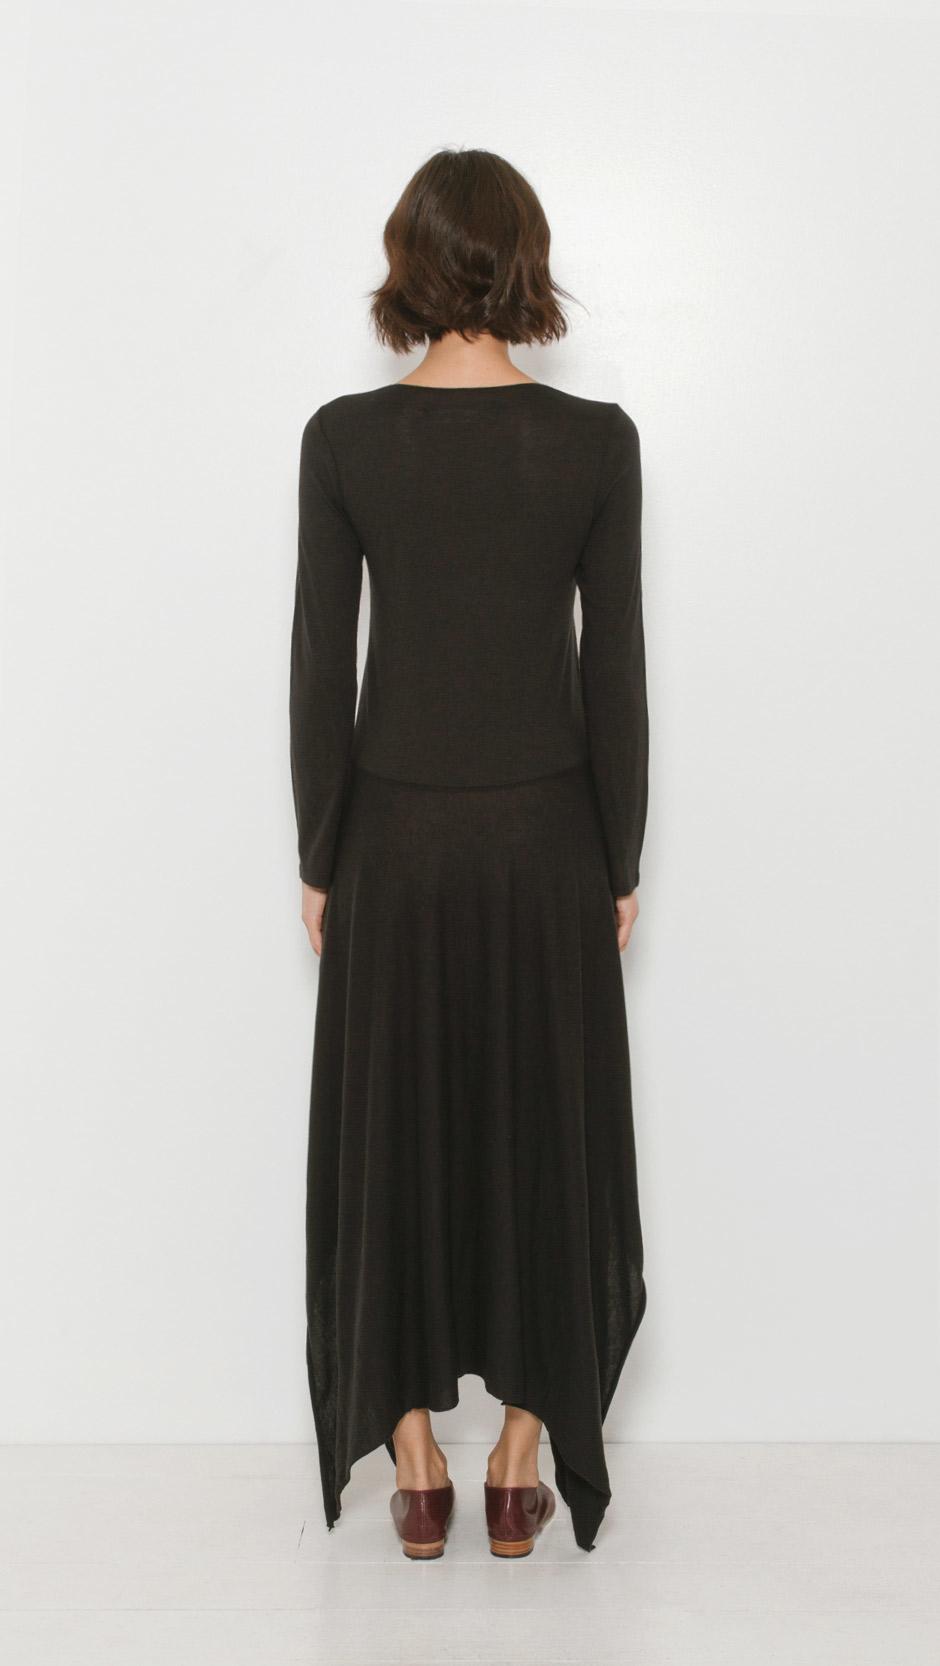 Raquel allegra long sleeve handkerchief dress in black lyst for Adam lippes women s long sleeve vee t shirt